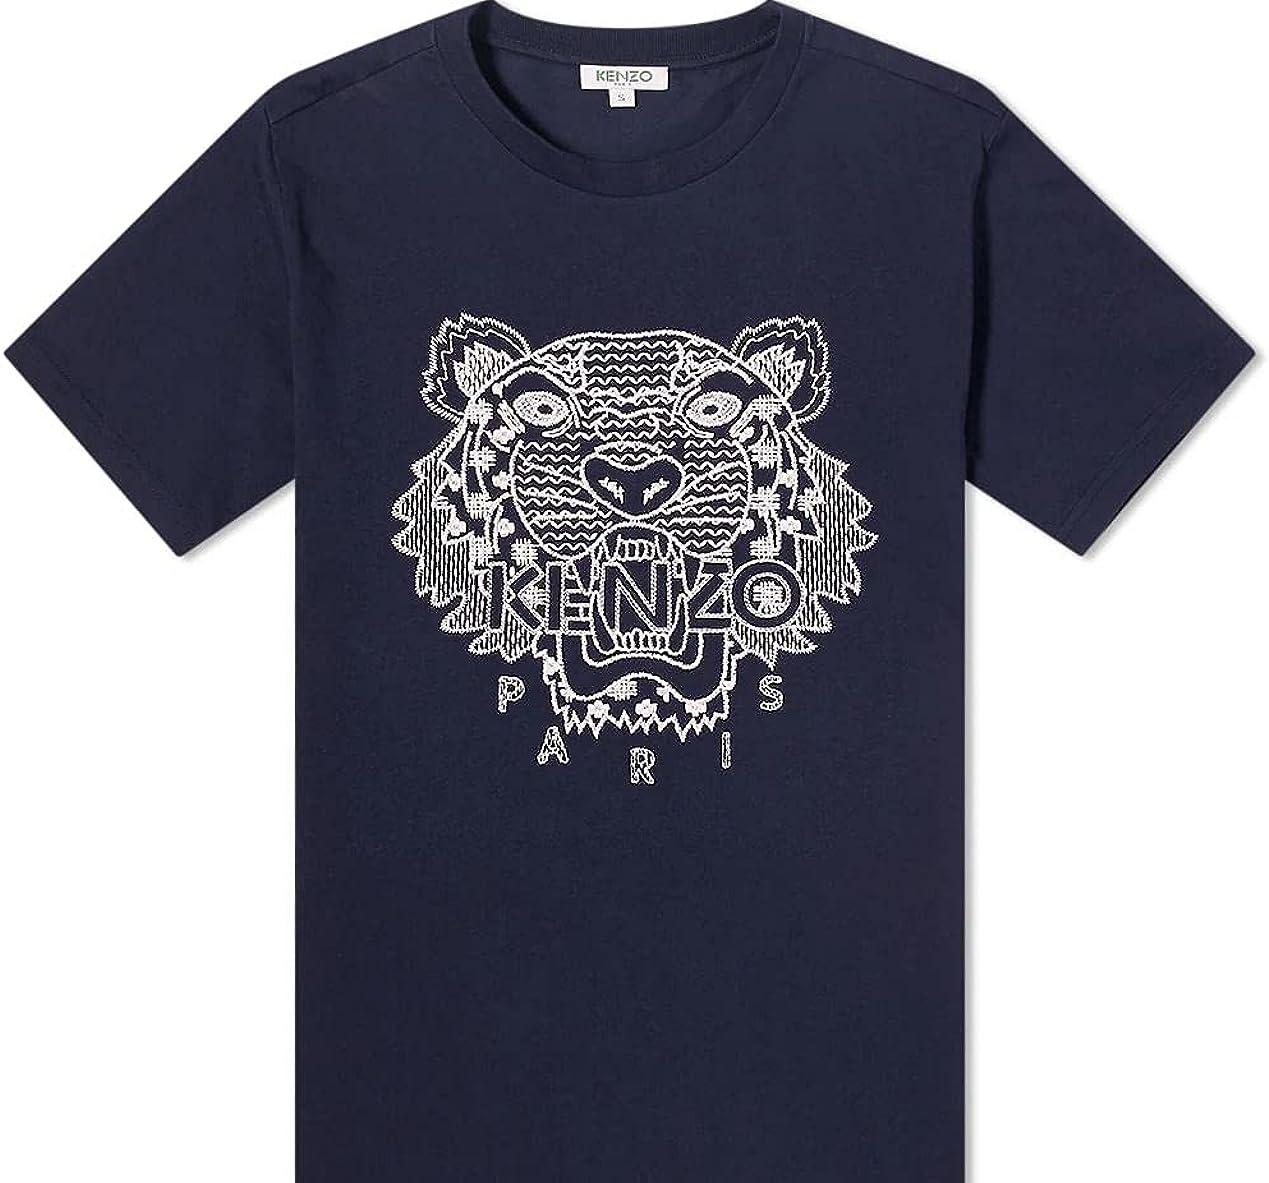 Kenzo Men's Embroidered Tiger Shibori Navy Blue Short Sleeve T-Shirt XXL